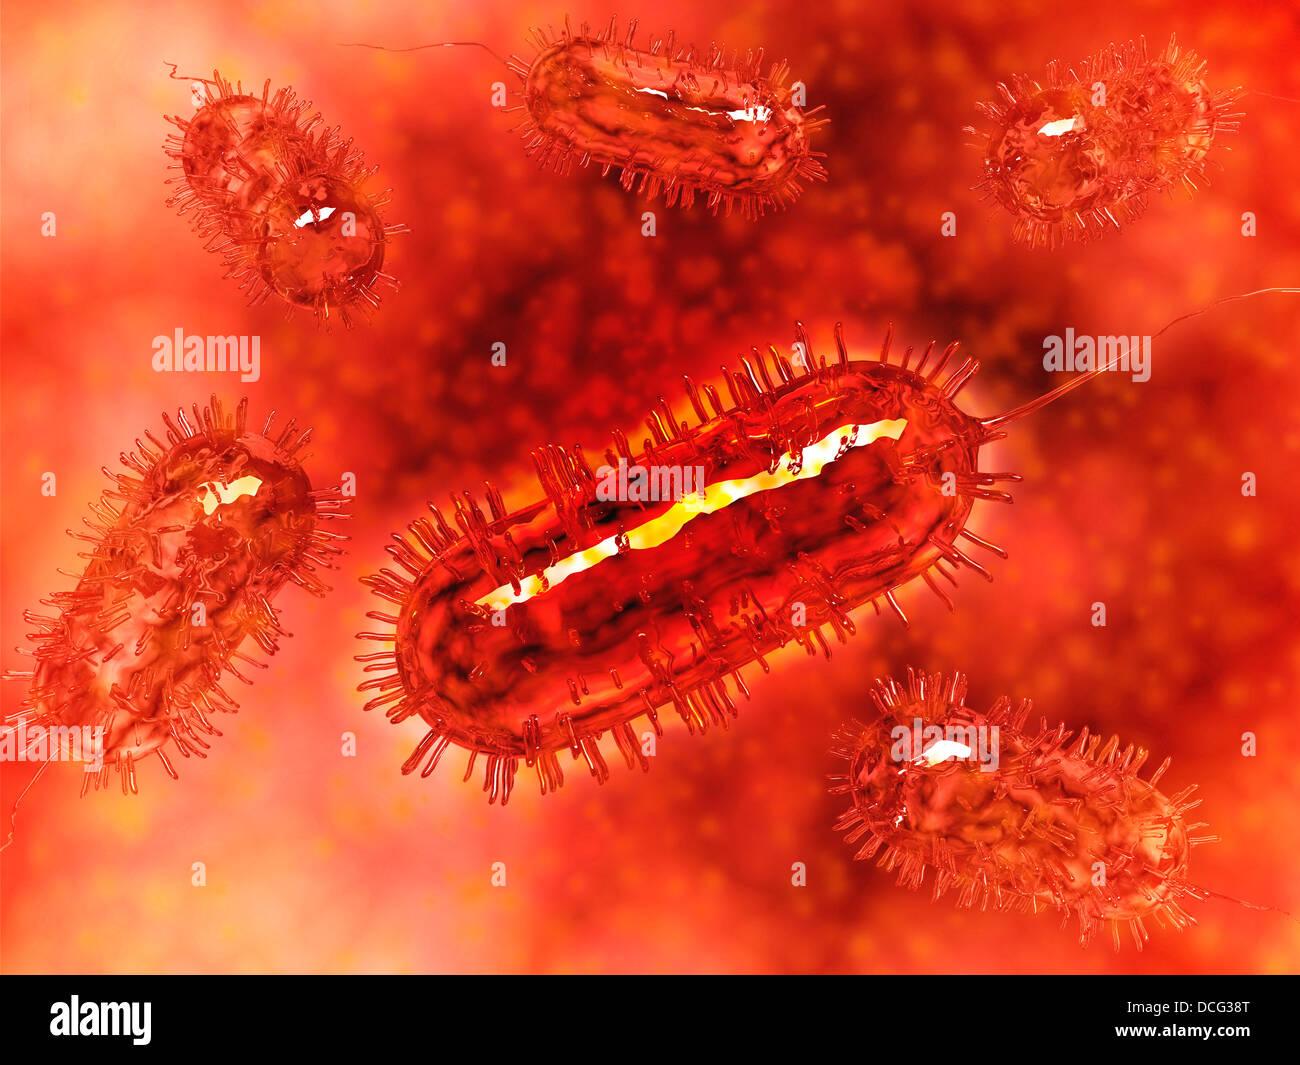 Group of Escherichia coli bacteria cells, known as E. Coli. - Stock Image